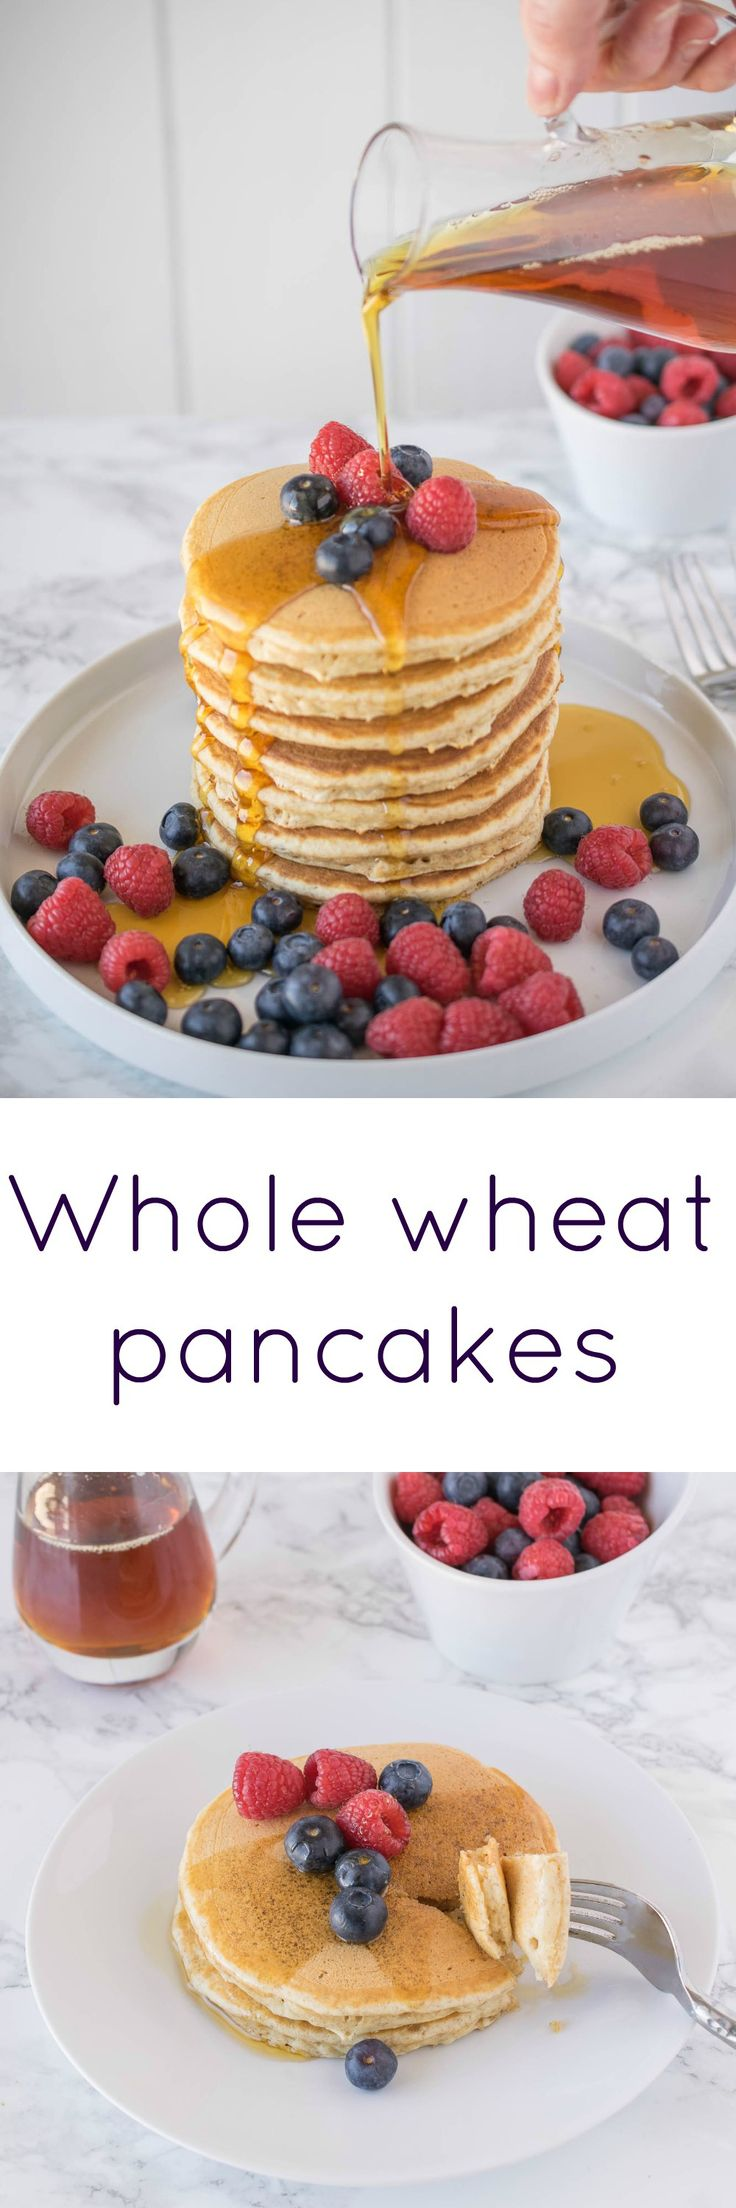 Whole wheat pancakes | Recipe | Whole Wheat Pancakes ...